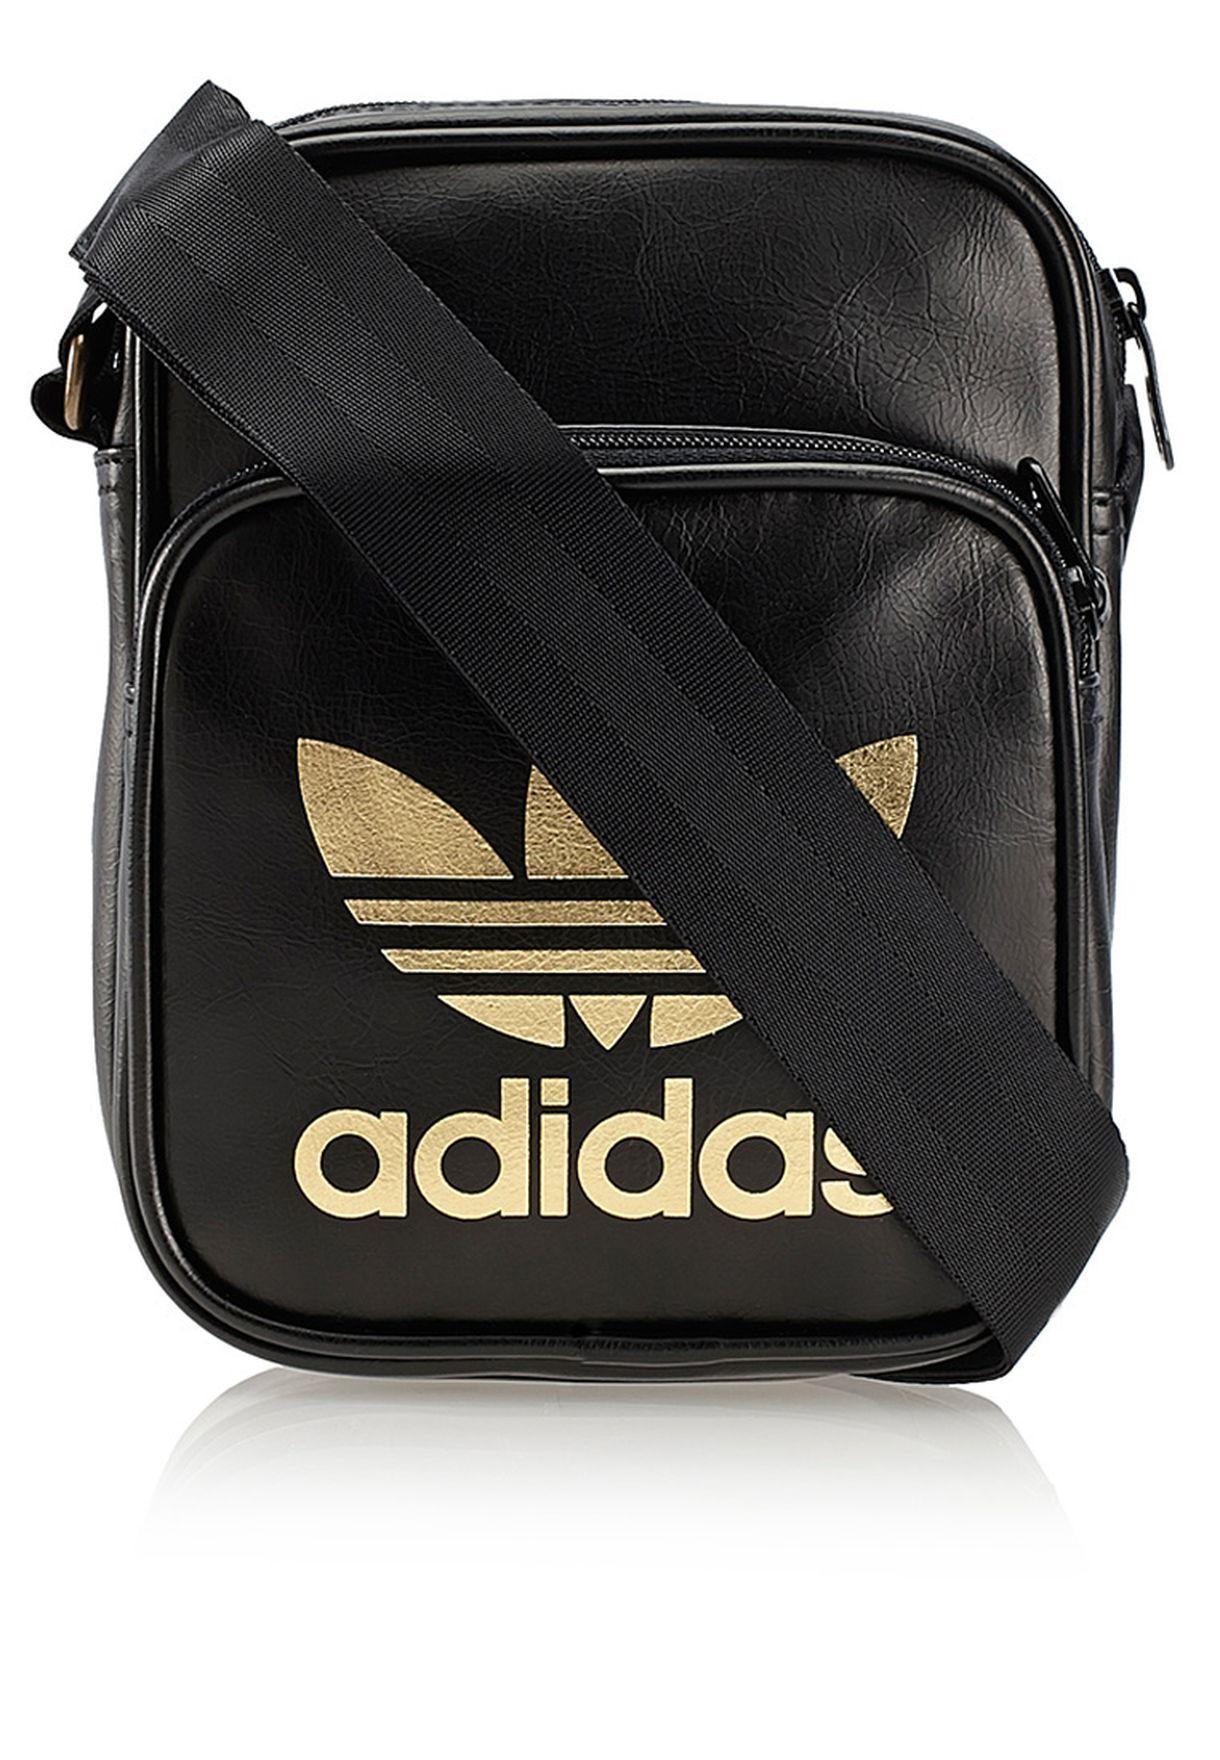 db2496b1ba4a Shop adidas Originals black AC Mini Bag G84848 for Men in Bahrain -  AD478AC28MYH